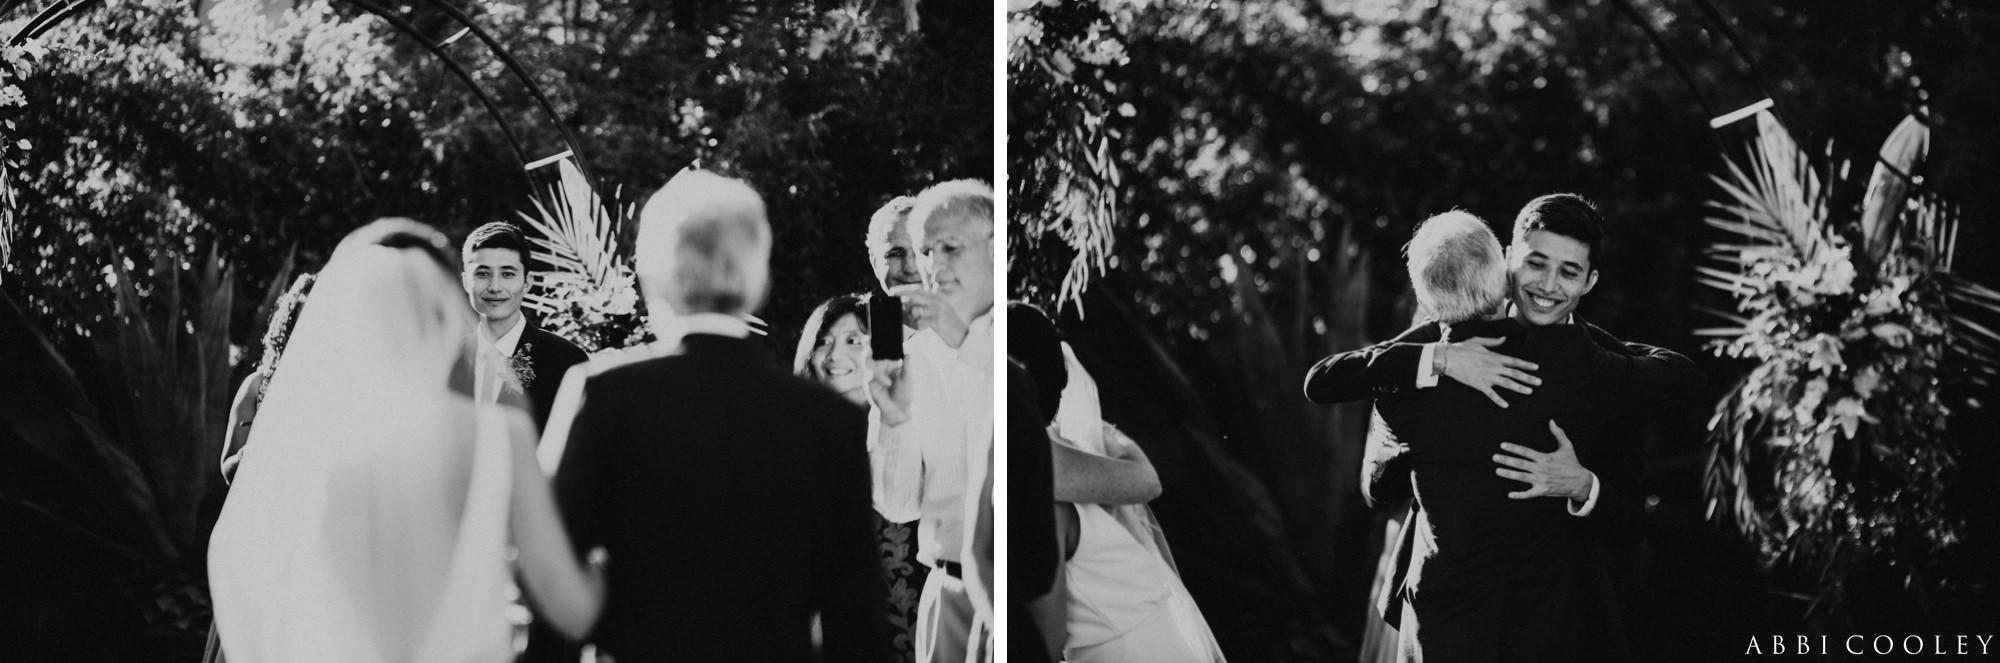 ABBI COOLEY PALM SPRINGS WEDDING_0796